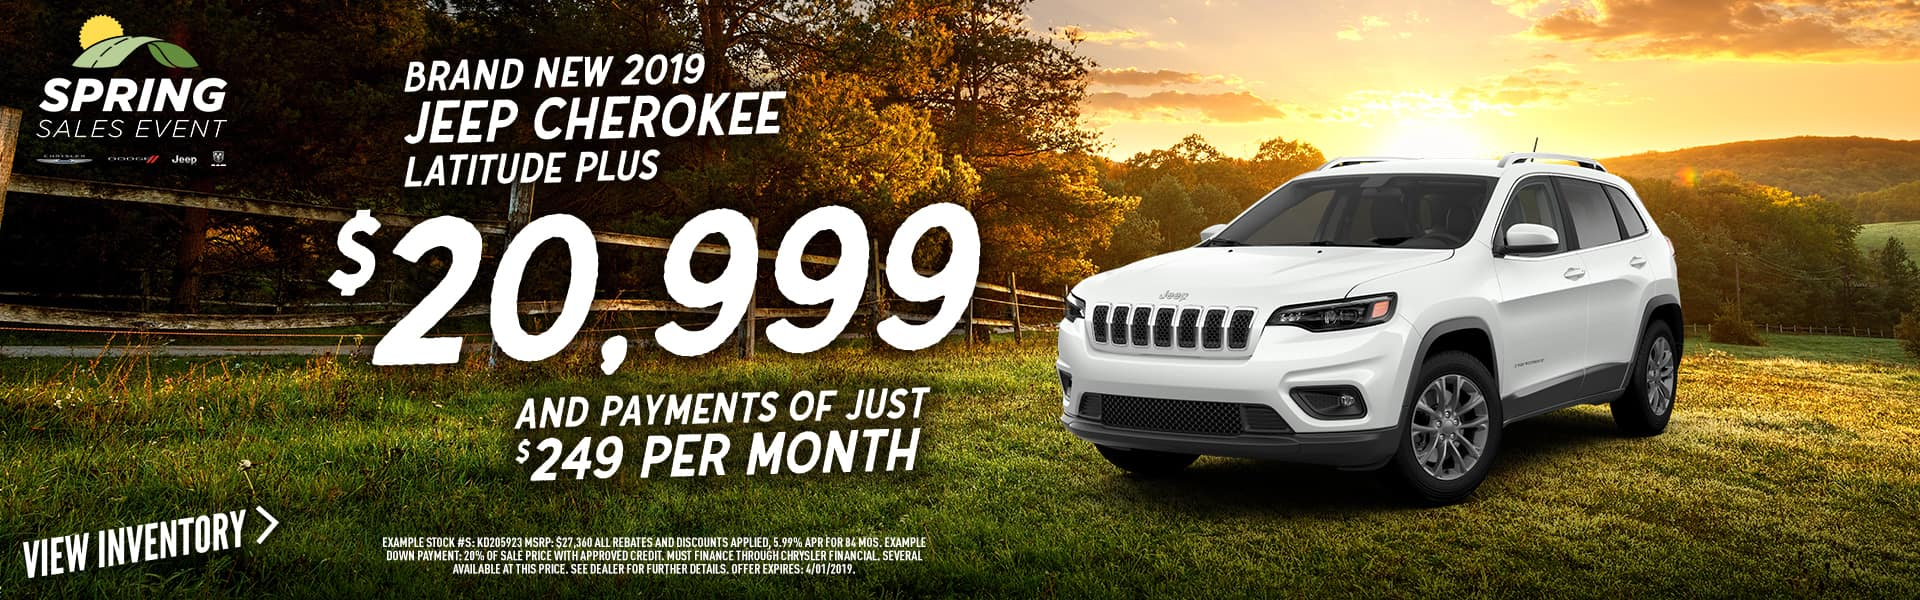 2019-jeep-cherokee-latitude-for-20999-tulsa